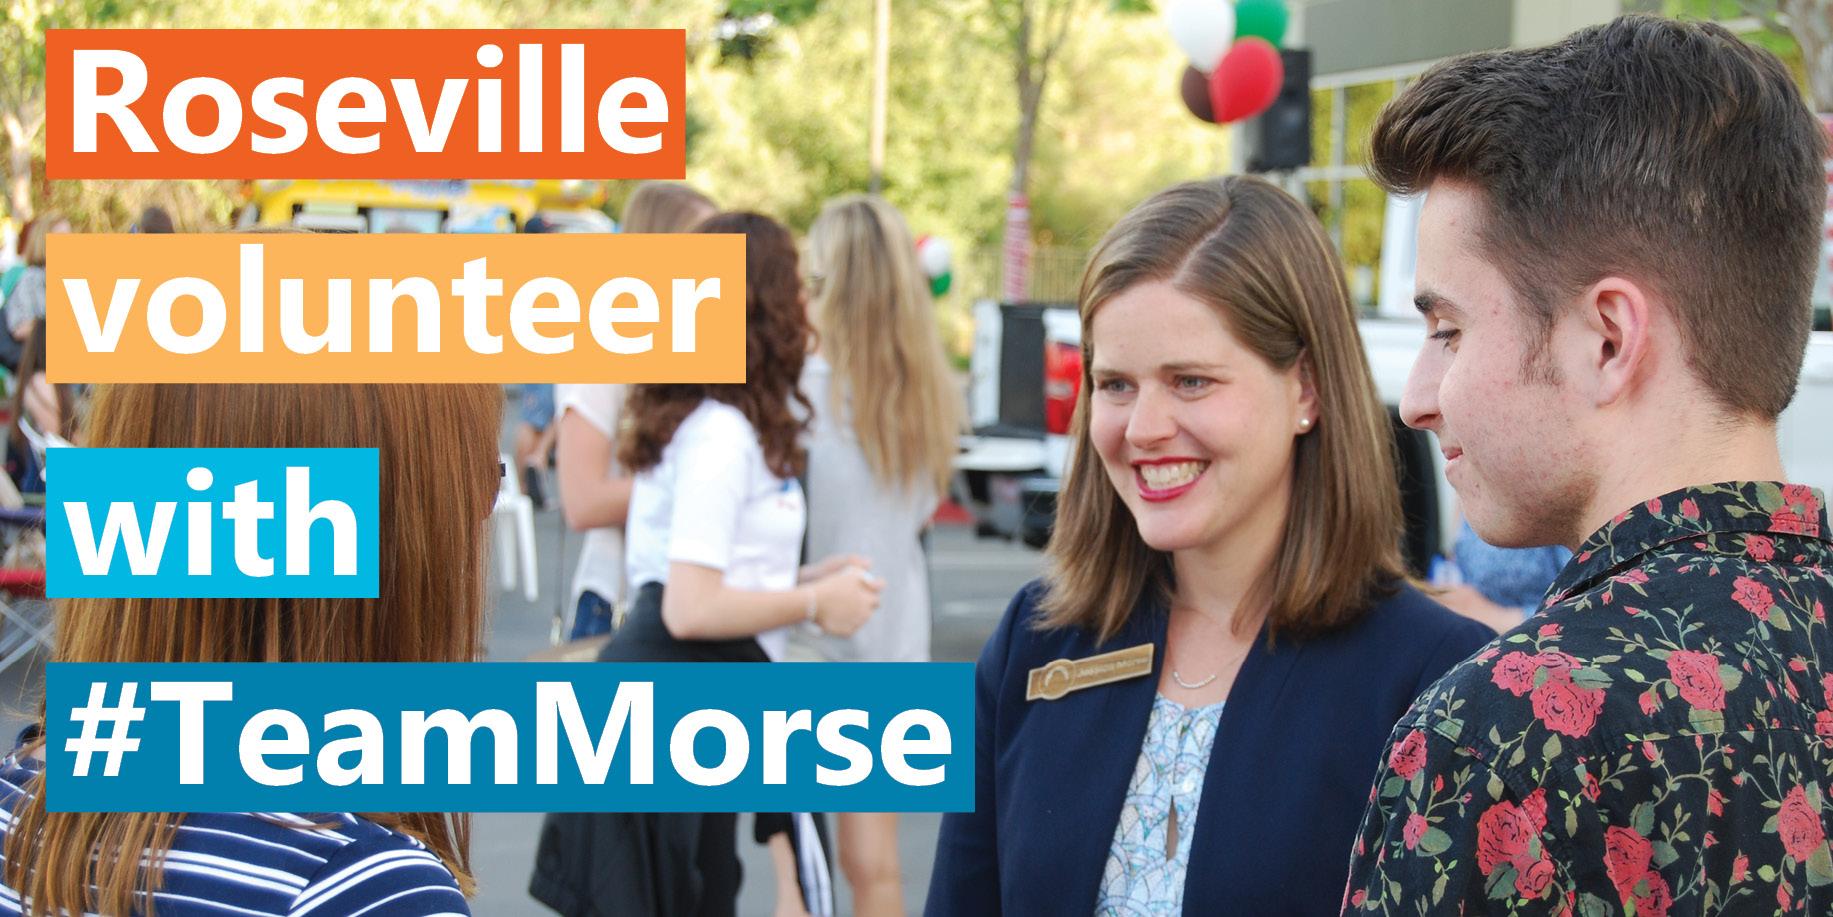 Roseville Volunteer Graphic.jpg